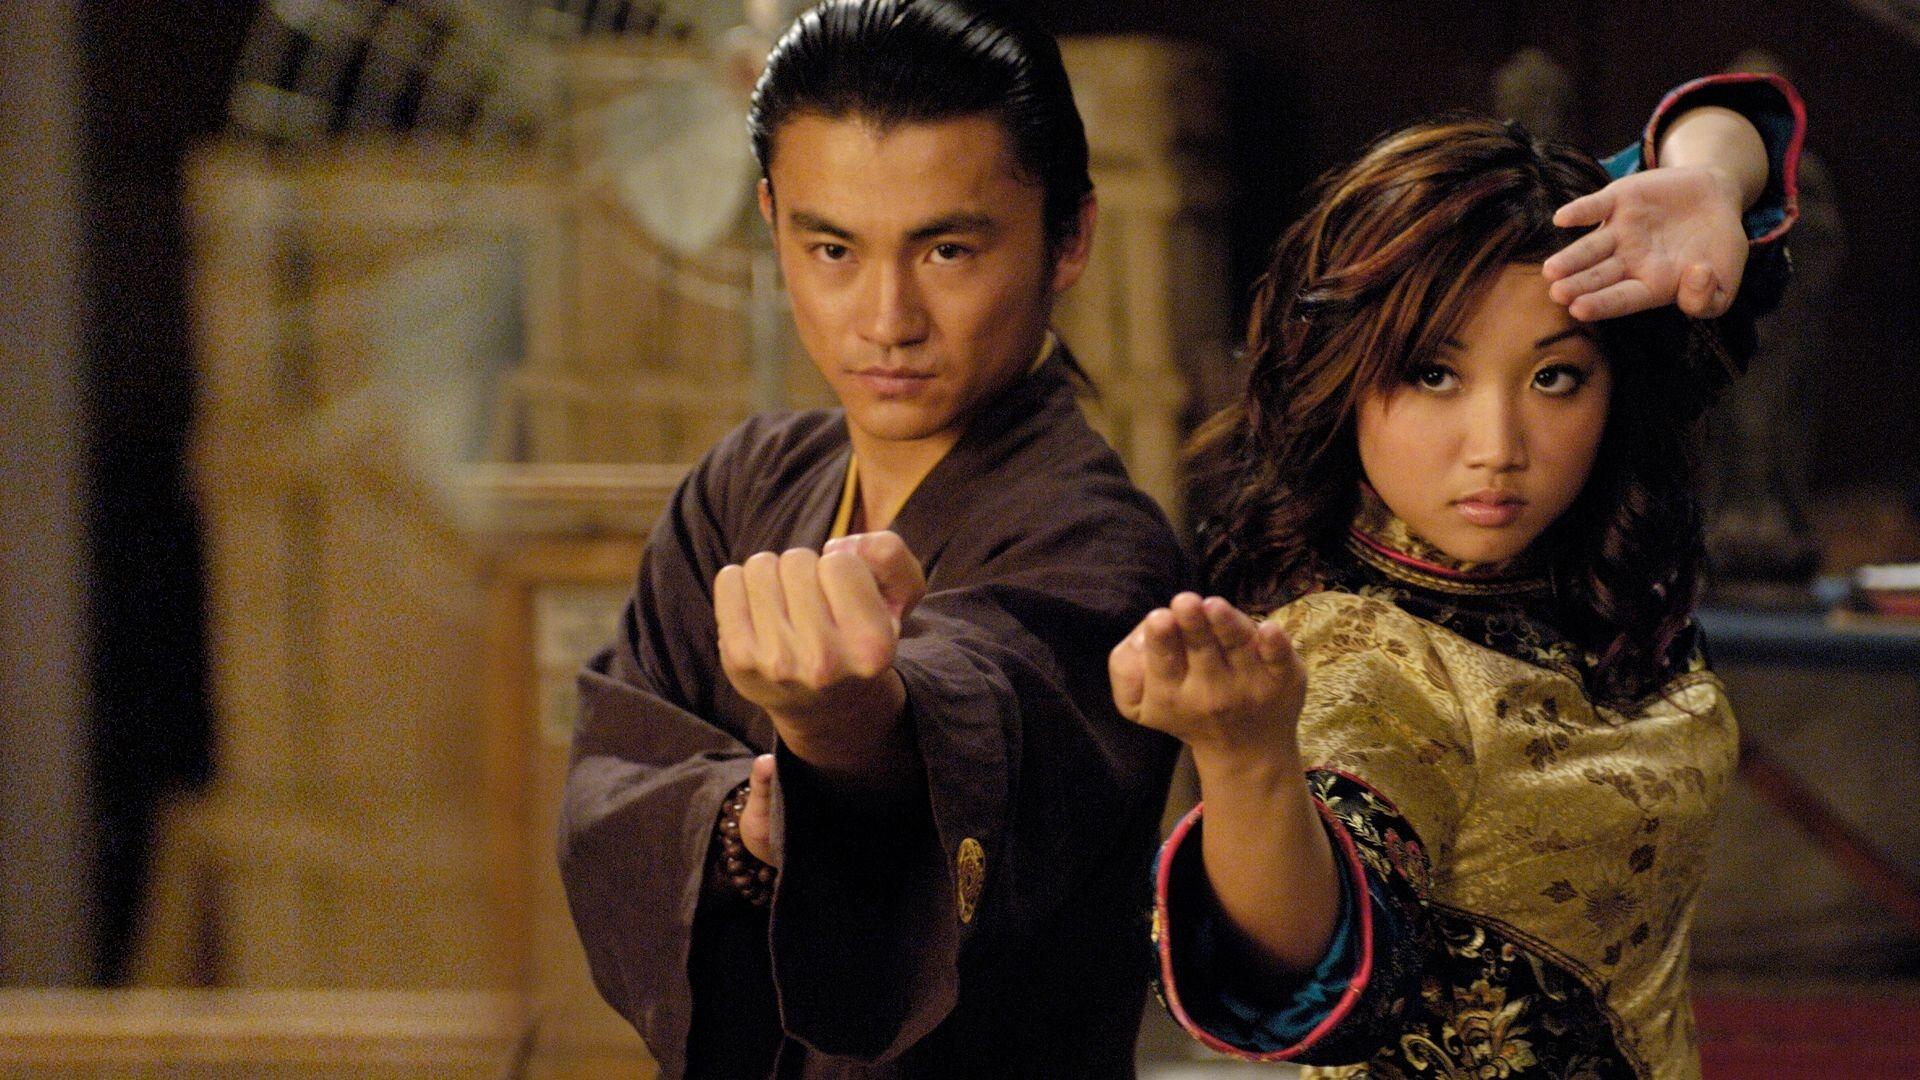 'Wendy Wu: La chica Kung Fu'